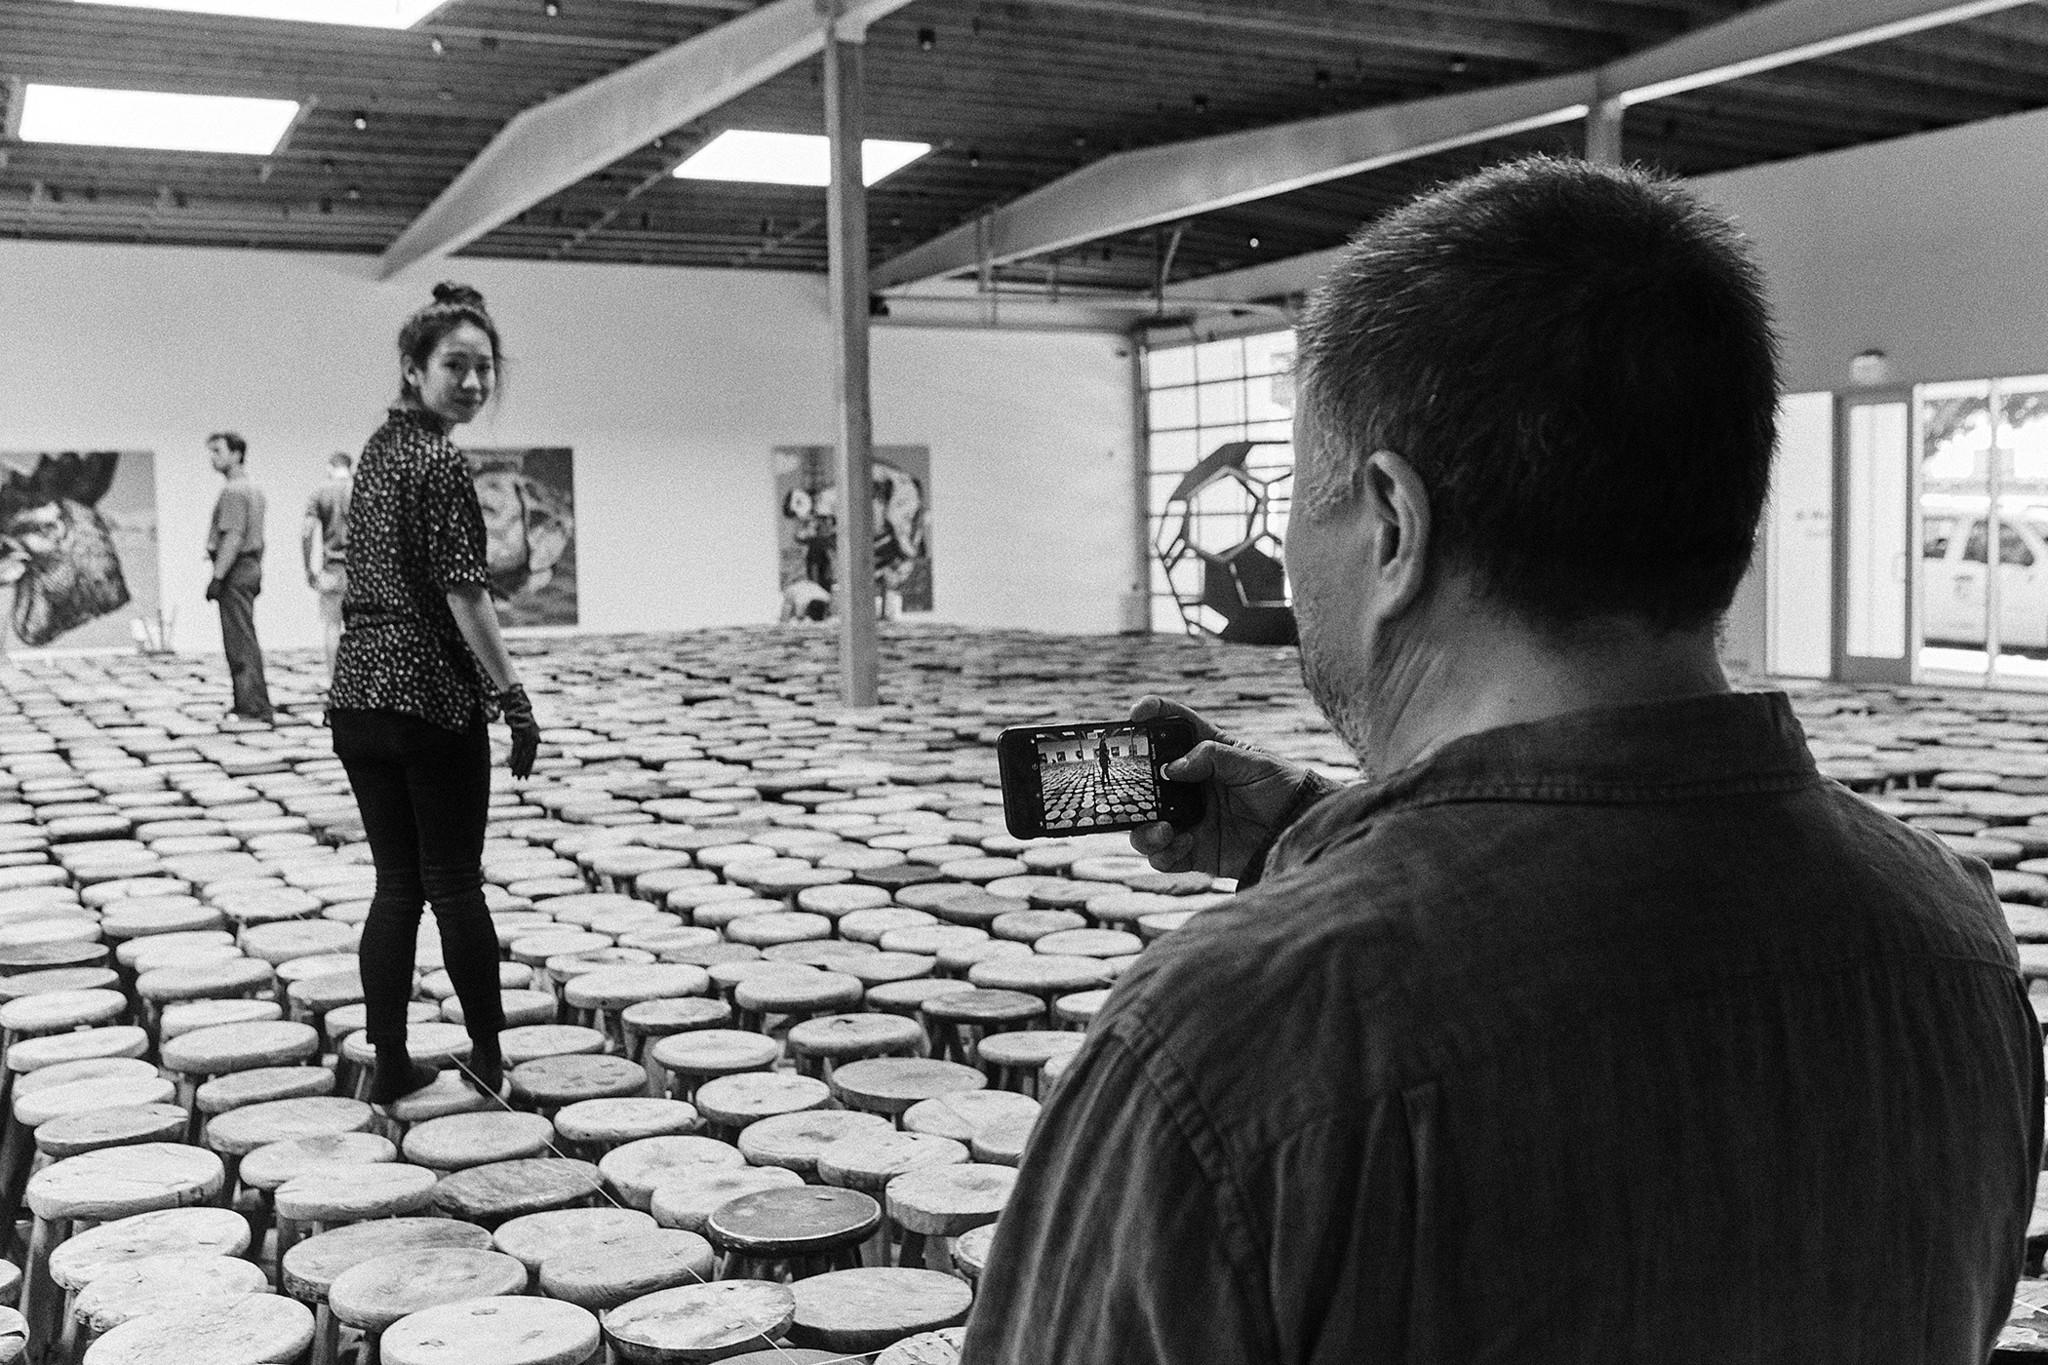 The Jeffrey Deitch gallery is showcasing Ai Weiwei's Stools (2013)